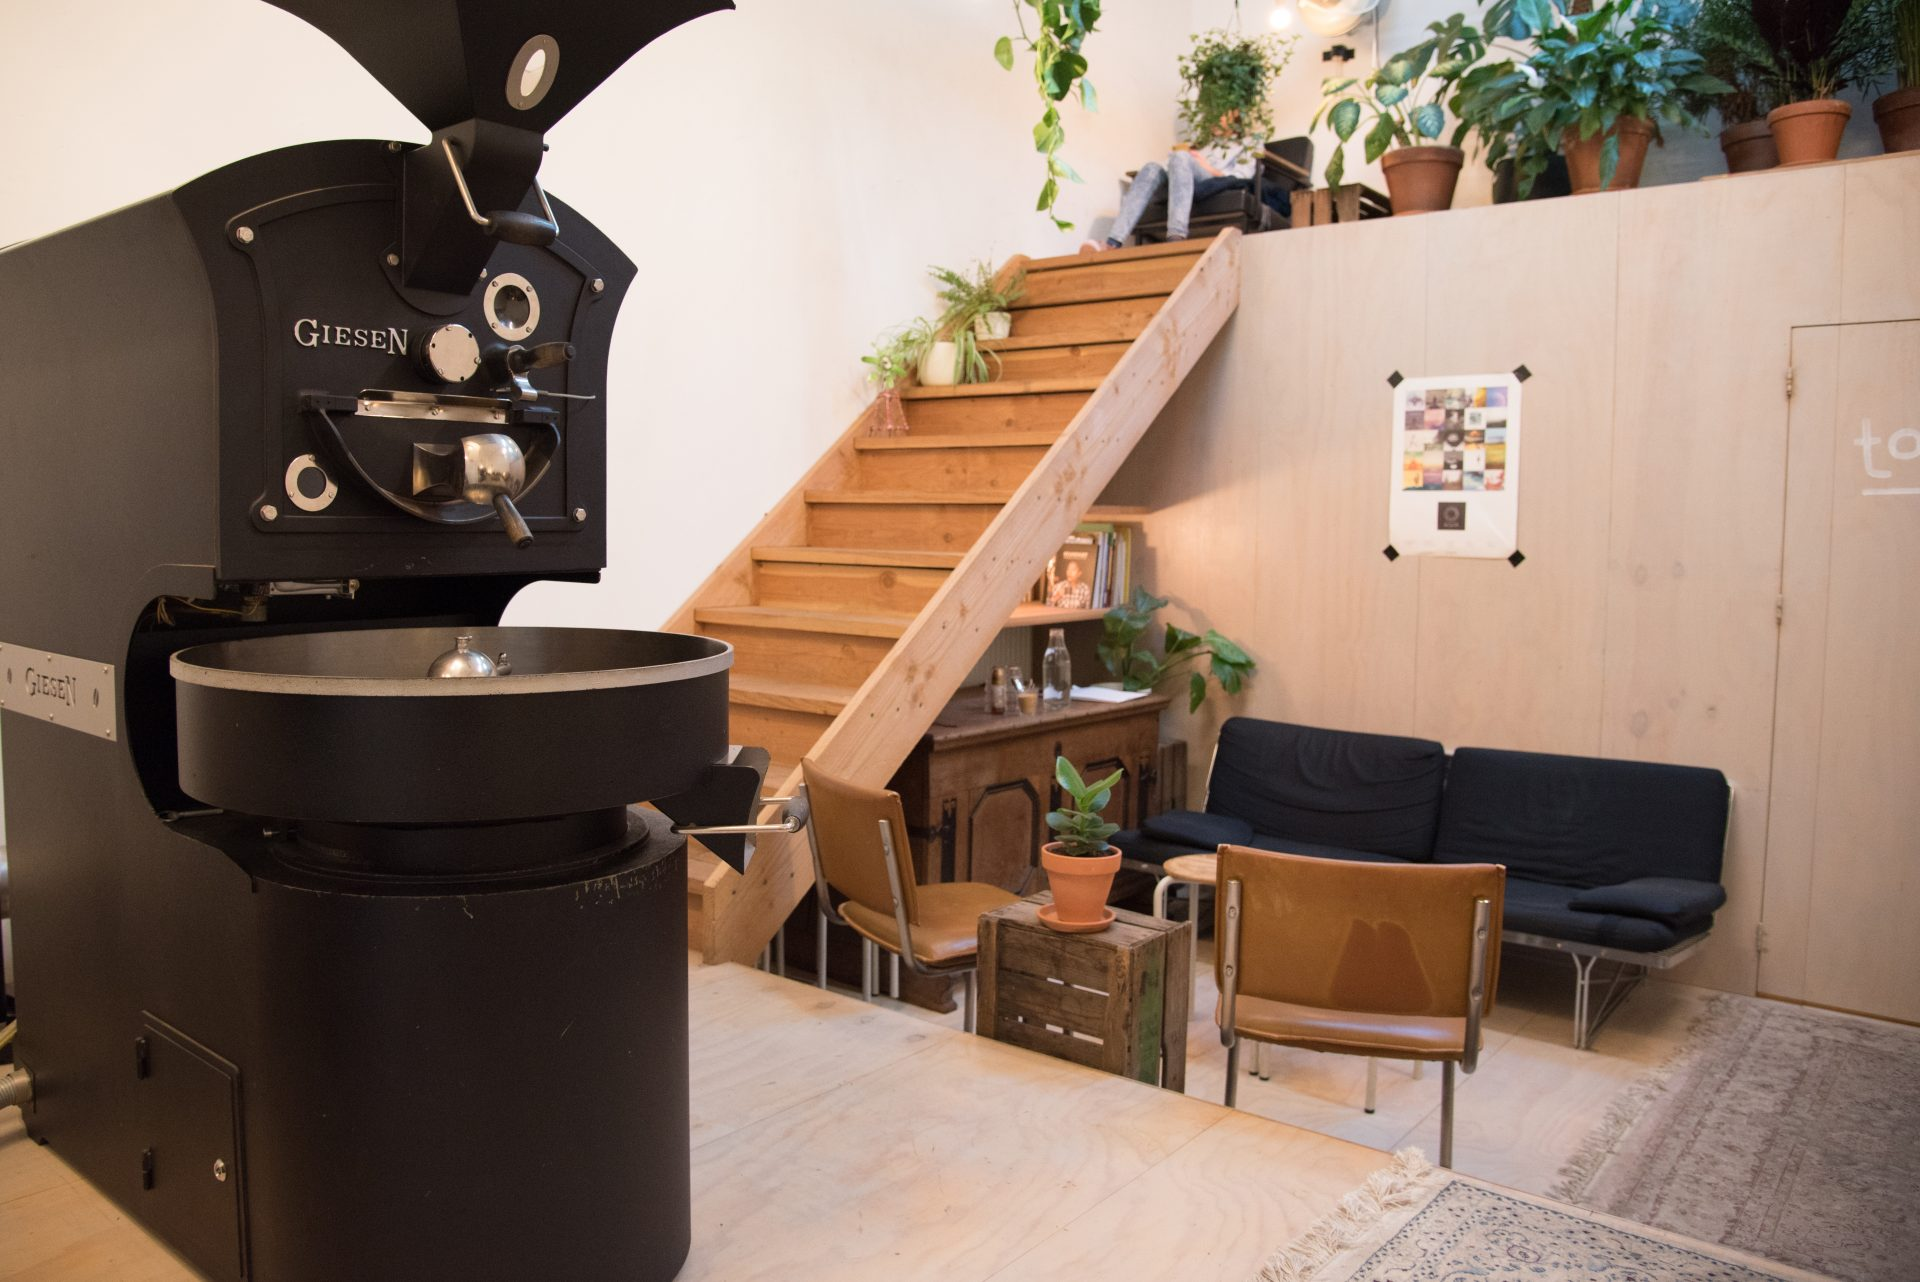 White Label Coffee in Amsterdam